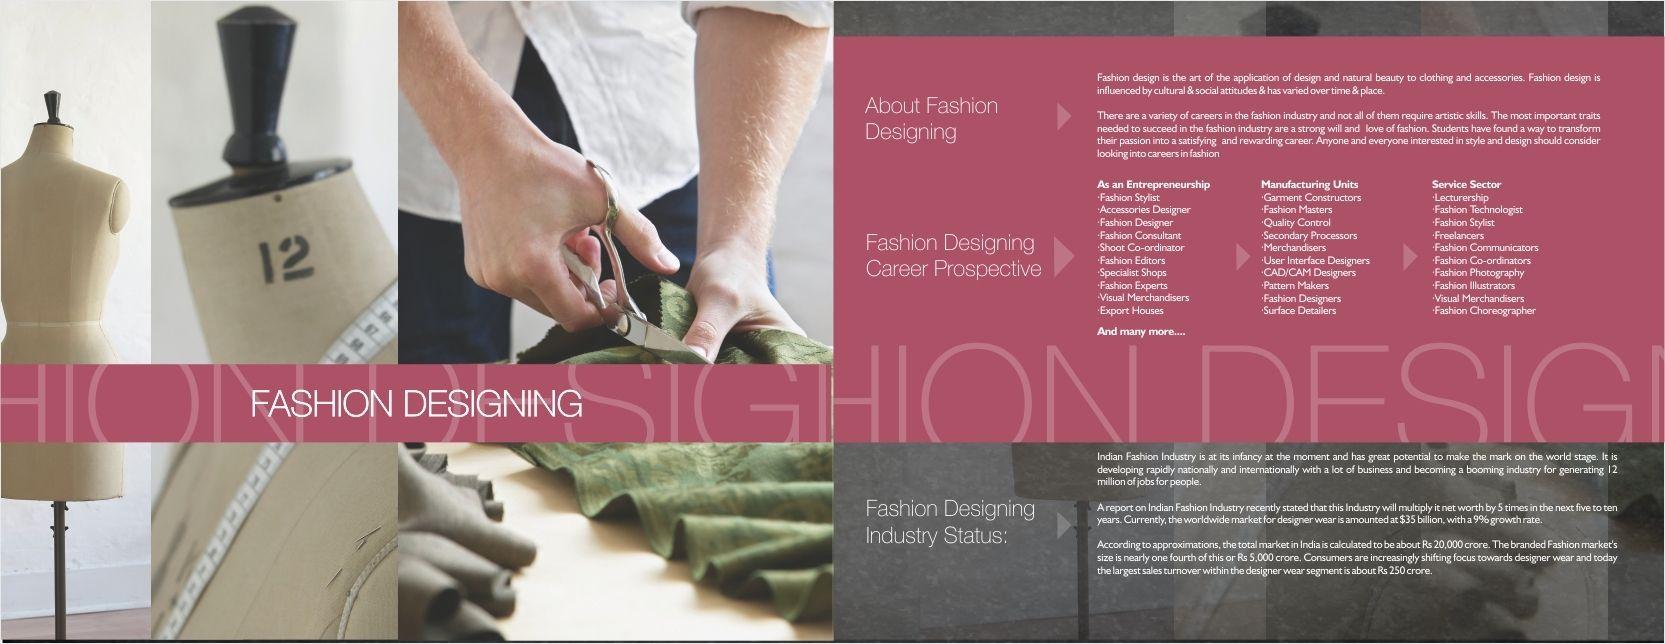 Fashion Designing Courses फ शन ड ज इन ग क र स In Kothrud Pune Inifd Pune Kothrud Id 6379238533